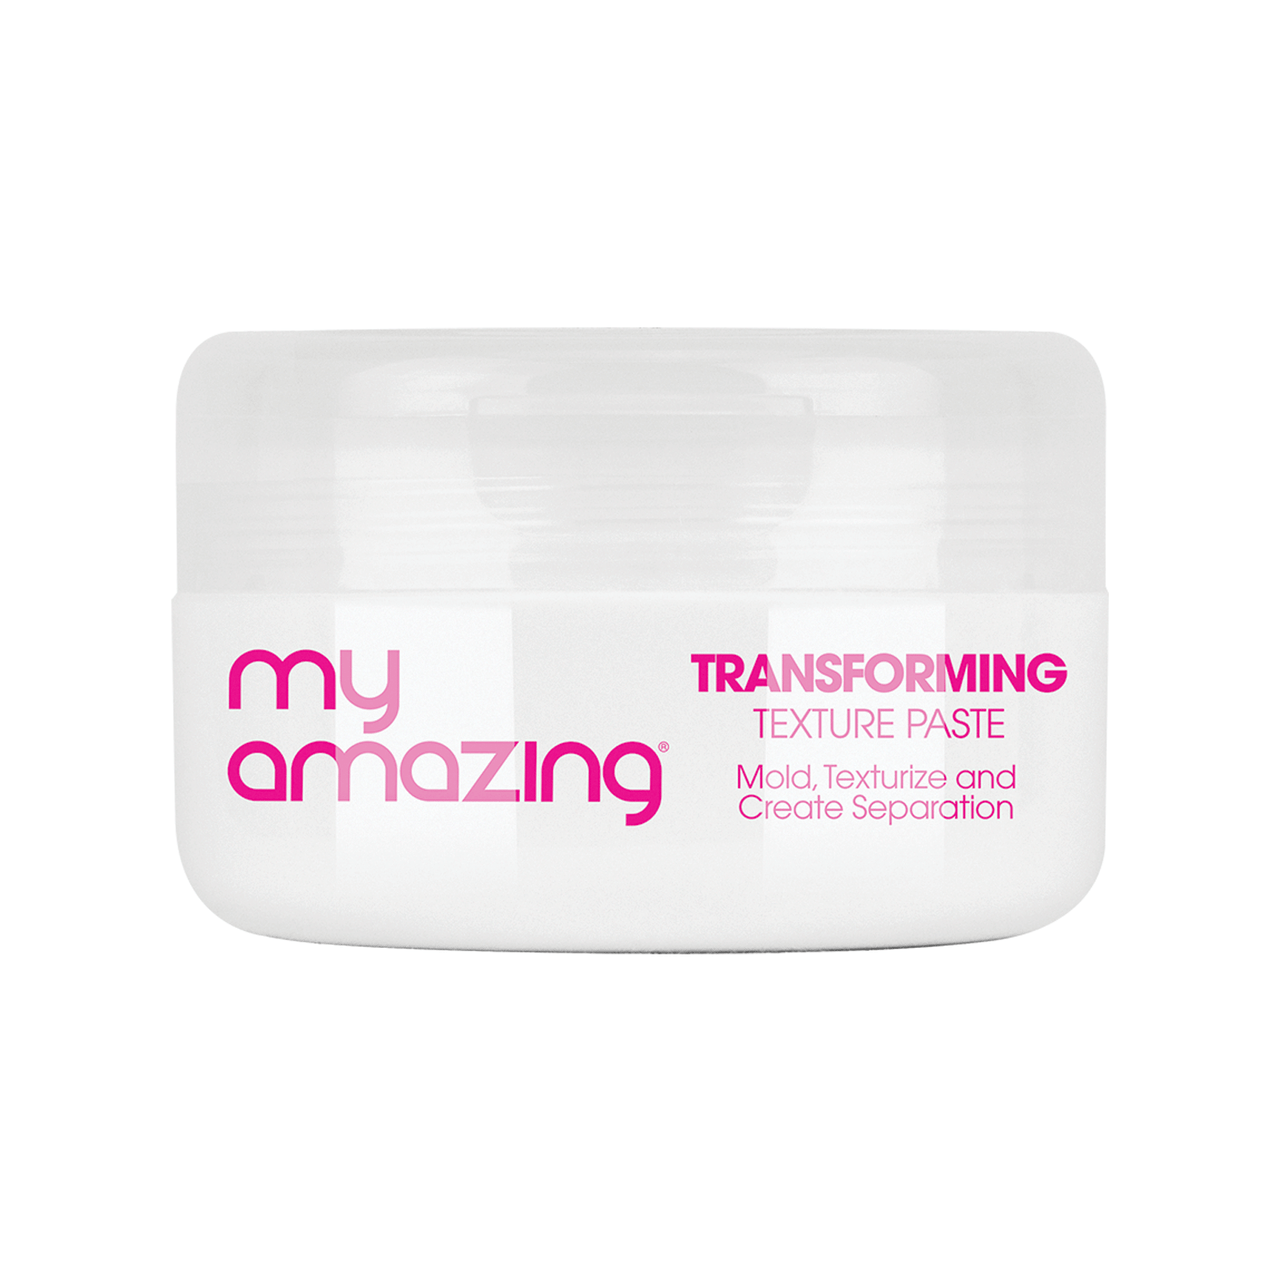 My Amazing Transforming Texture Paste 2.65 Oz